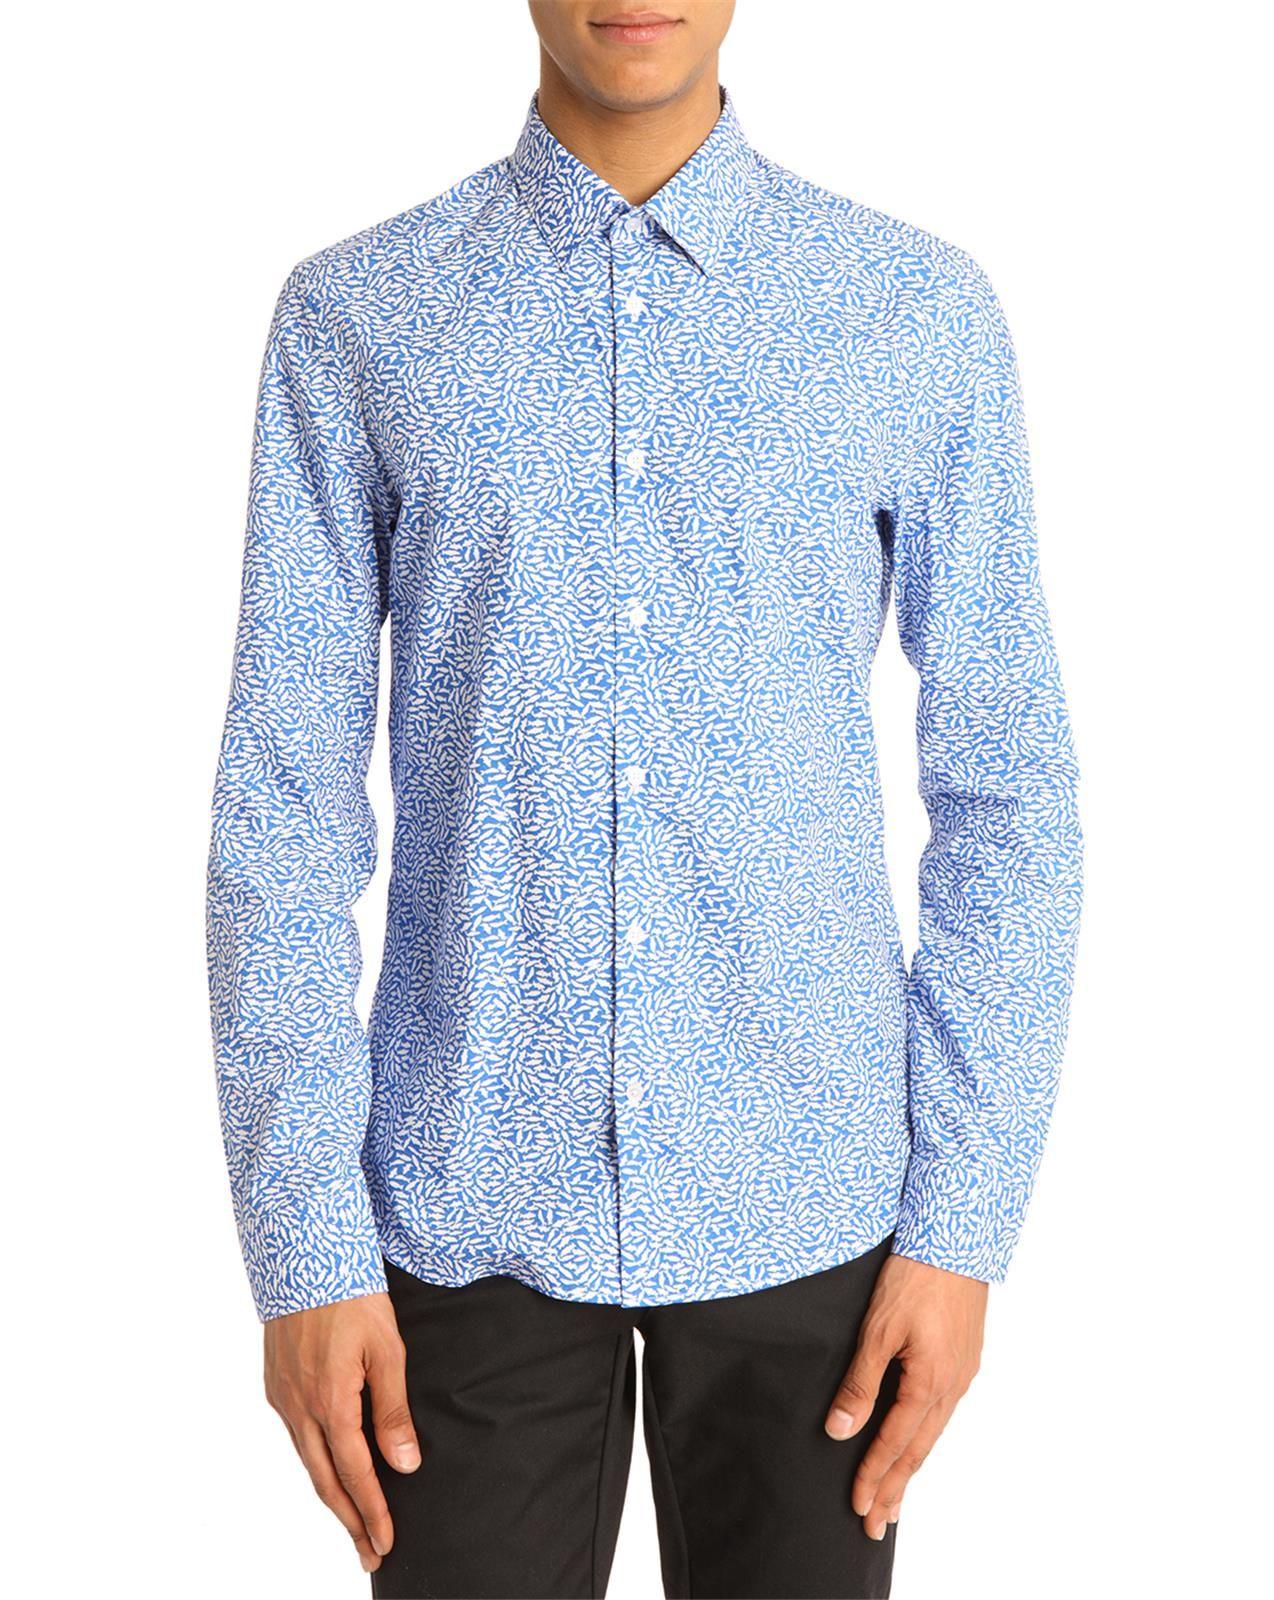 Kenzo micro fish blue print shirt in blue for men lyst for Fish print shirt